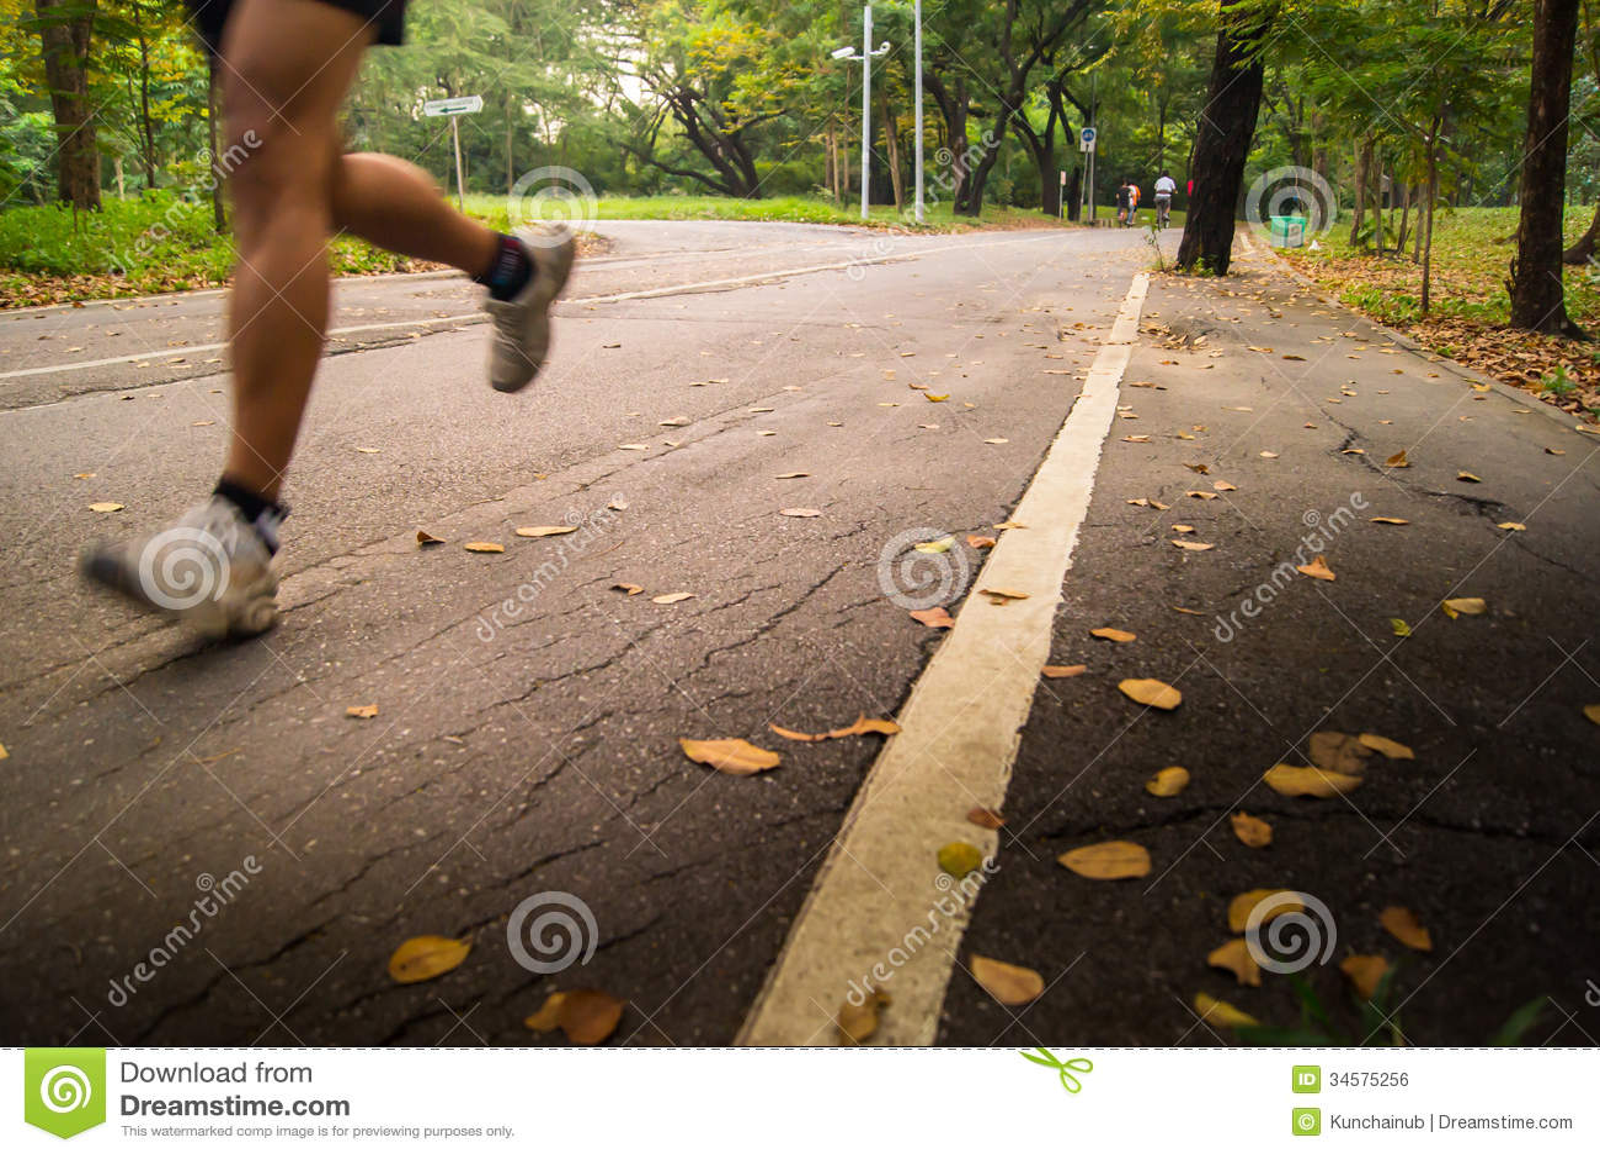 Running Way Royalty Free Stock Image - Image: 34575256